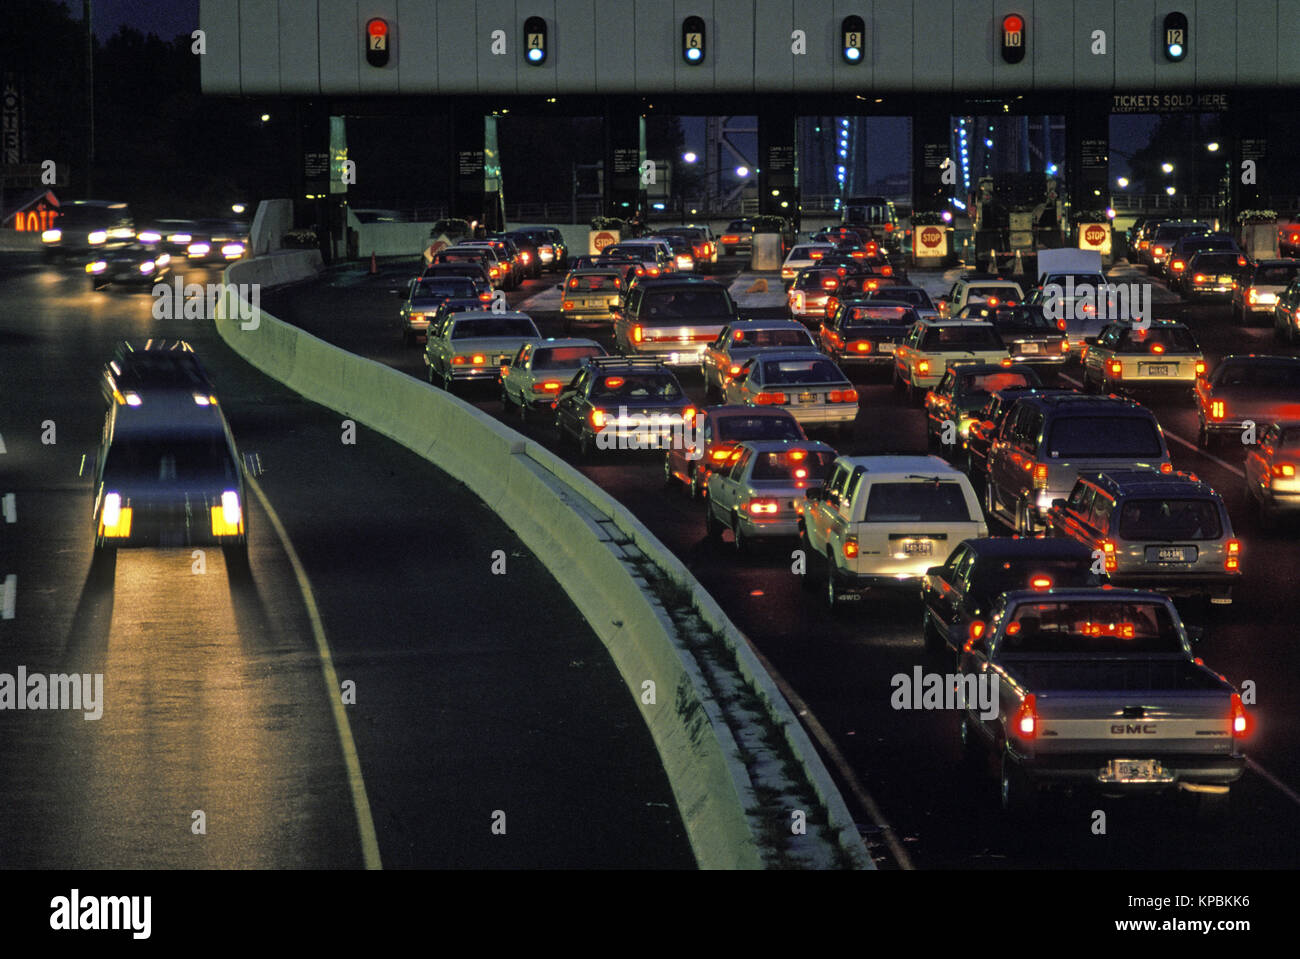 1988 HISTORICAL AUTOMOBILES TOLL PLAZA GEORGE WASHINGTON BRIDGE NEW JERSEY USA - Stock Image